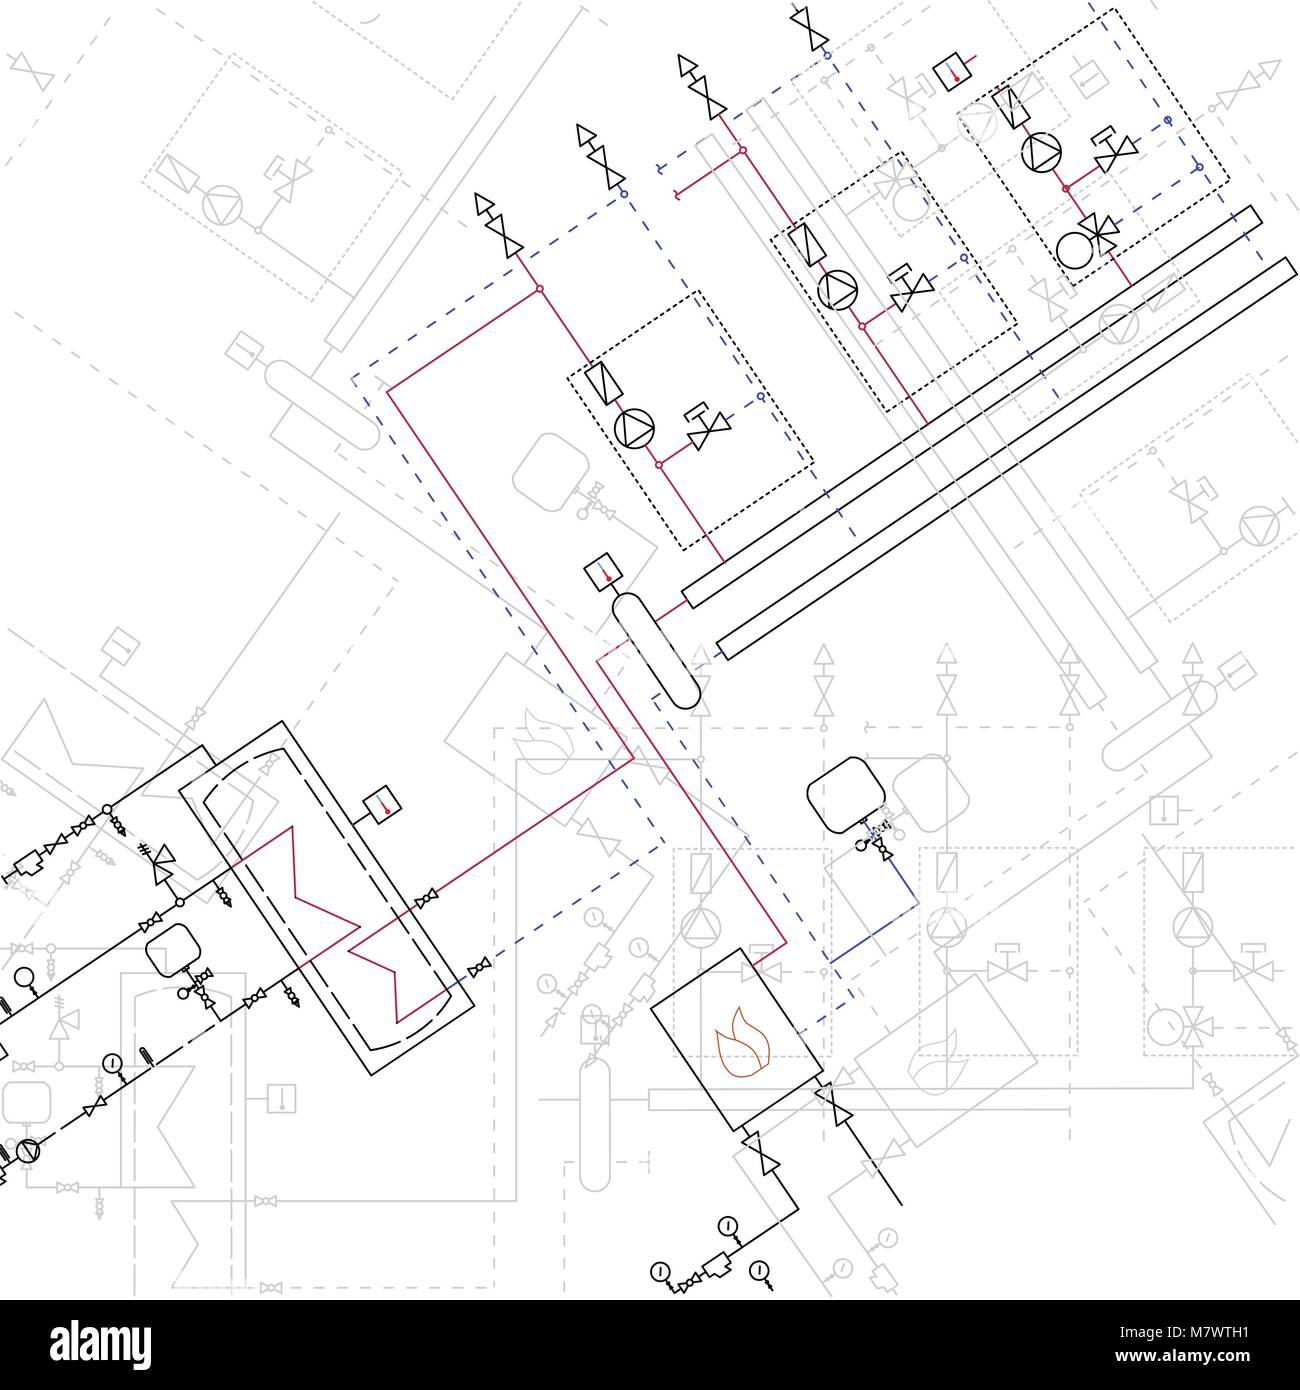 Urban Plan Stockfotos & Urban Plan Bilder - Seite 7 - Alamy